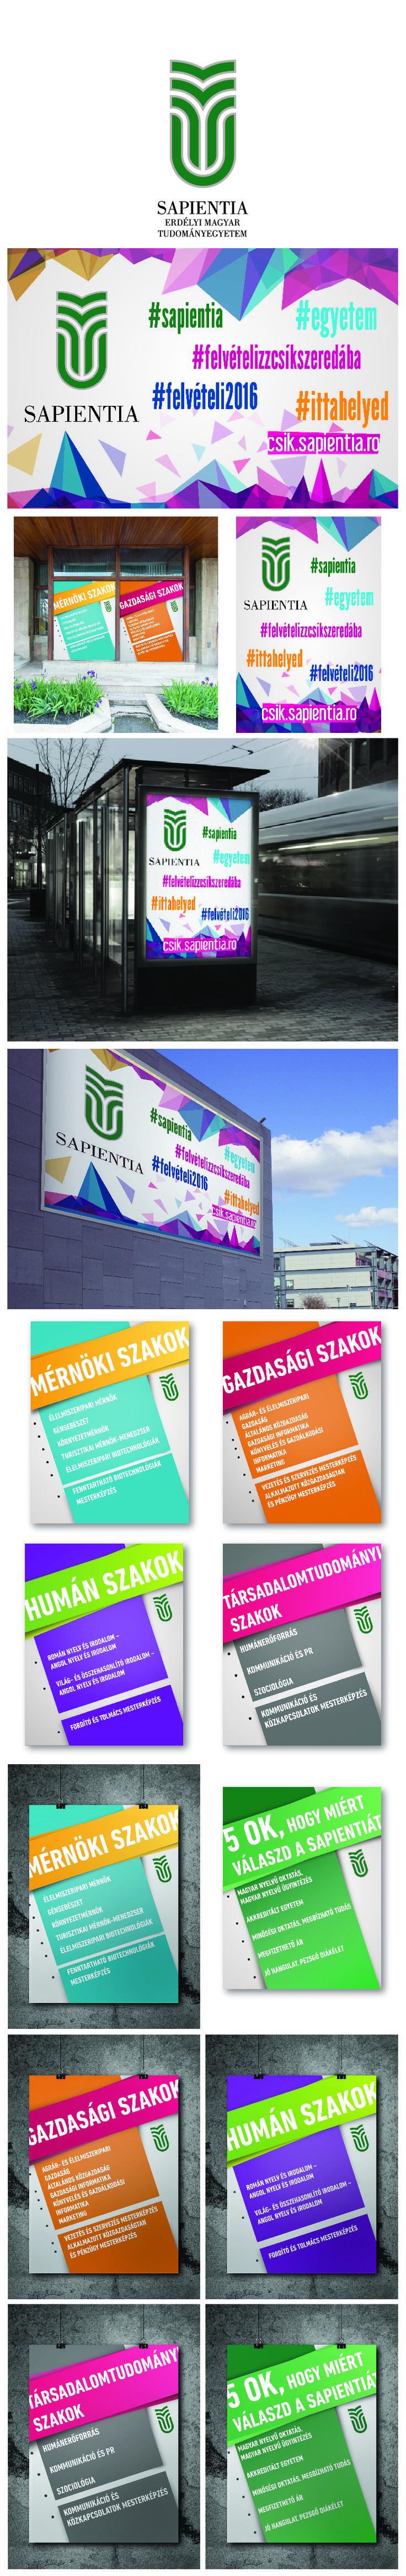 Campaign design for Sapientia Hungarian University of Transylvania